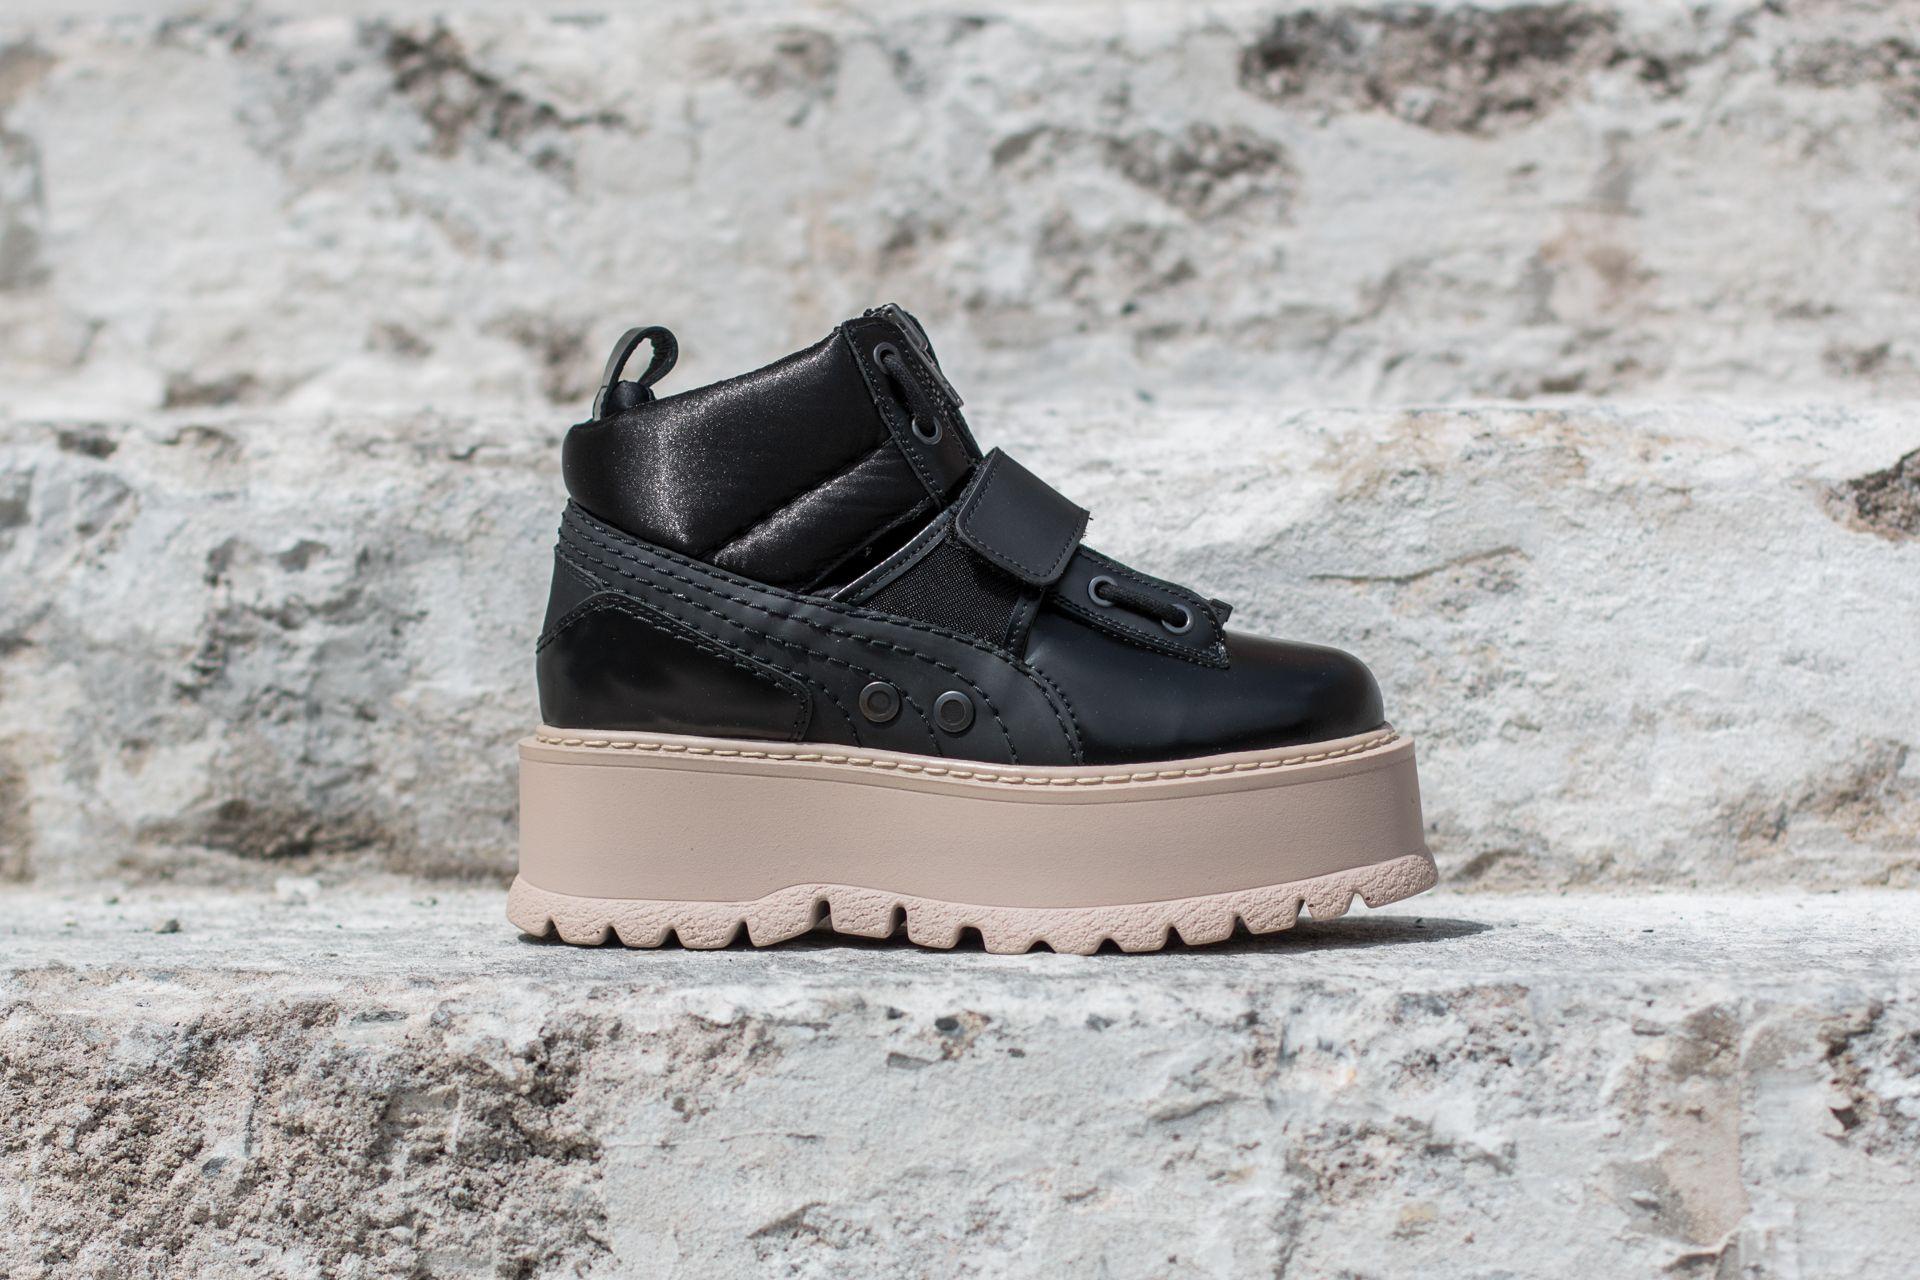 Puma FENTY Sneaker Boot Strap Wns Puma Black Puma Black Pink Tint | Footshop